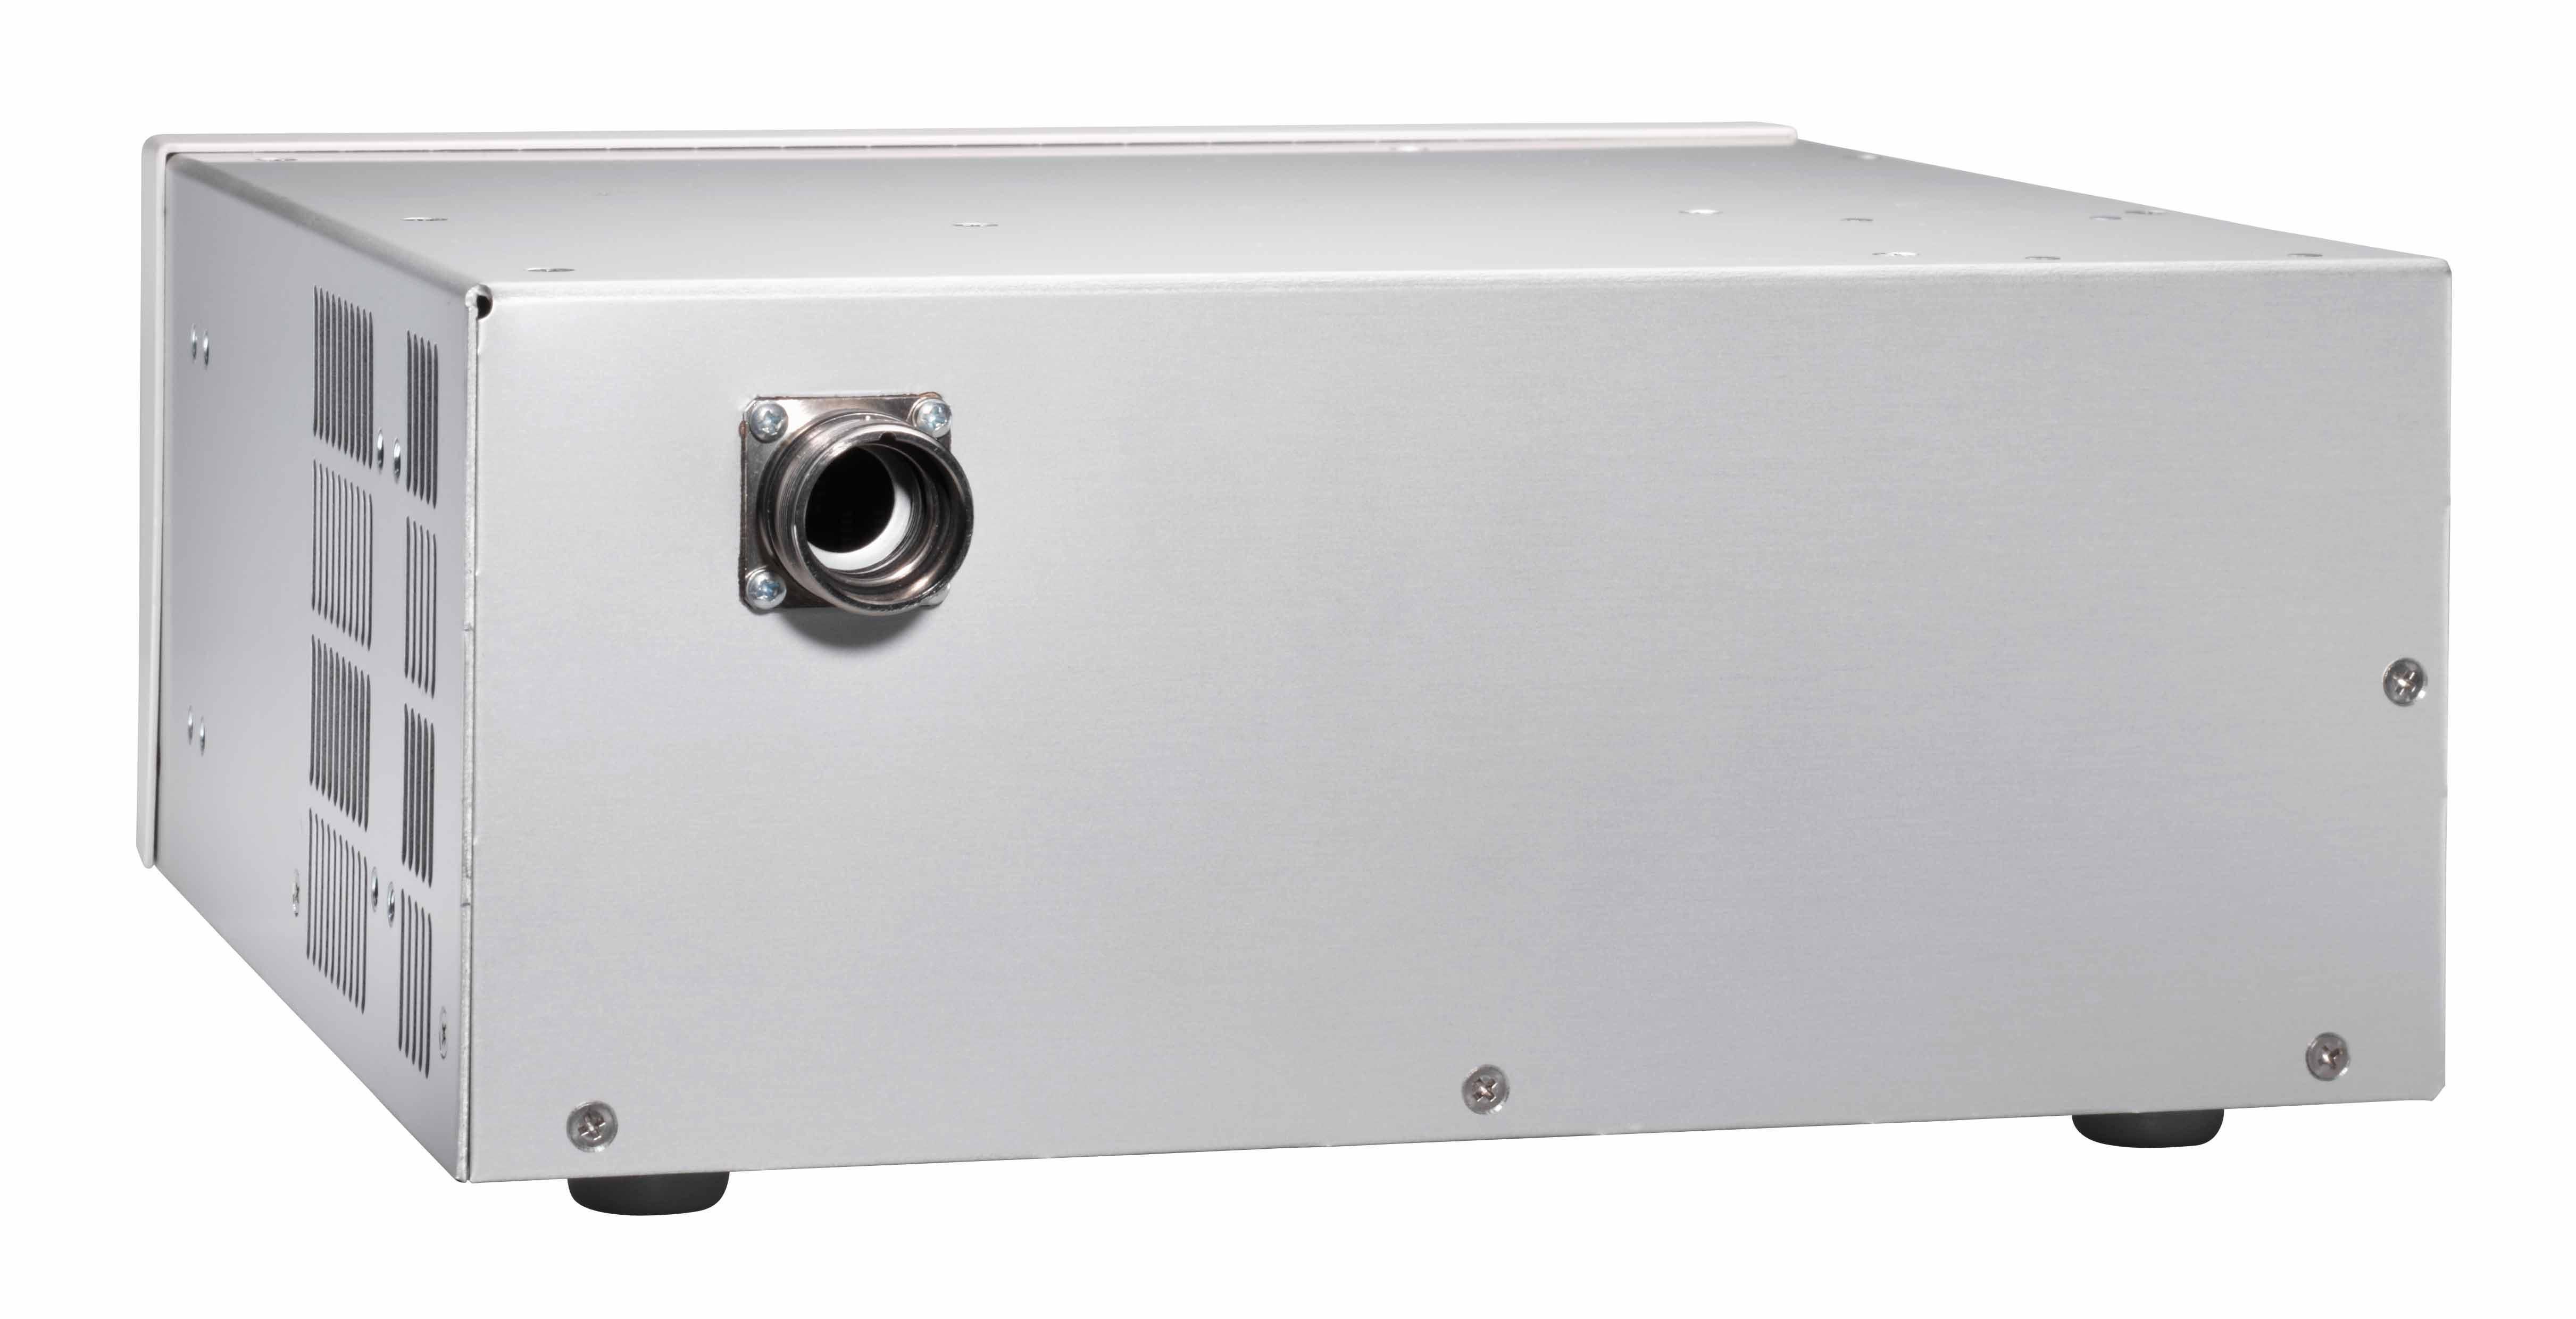 Generateur haute tension compact non instrumente 70 kv